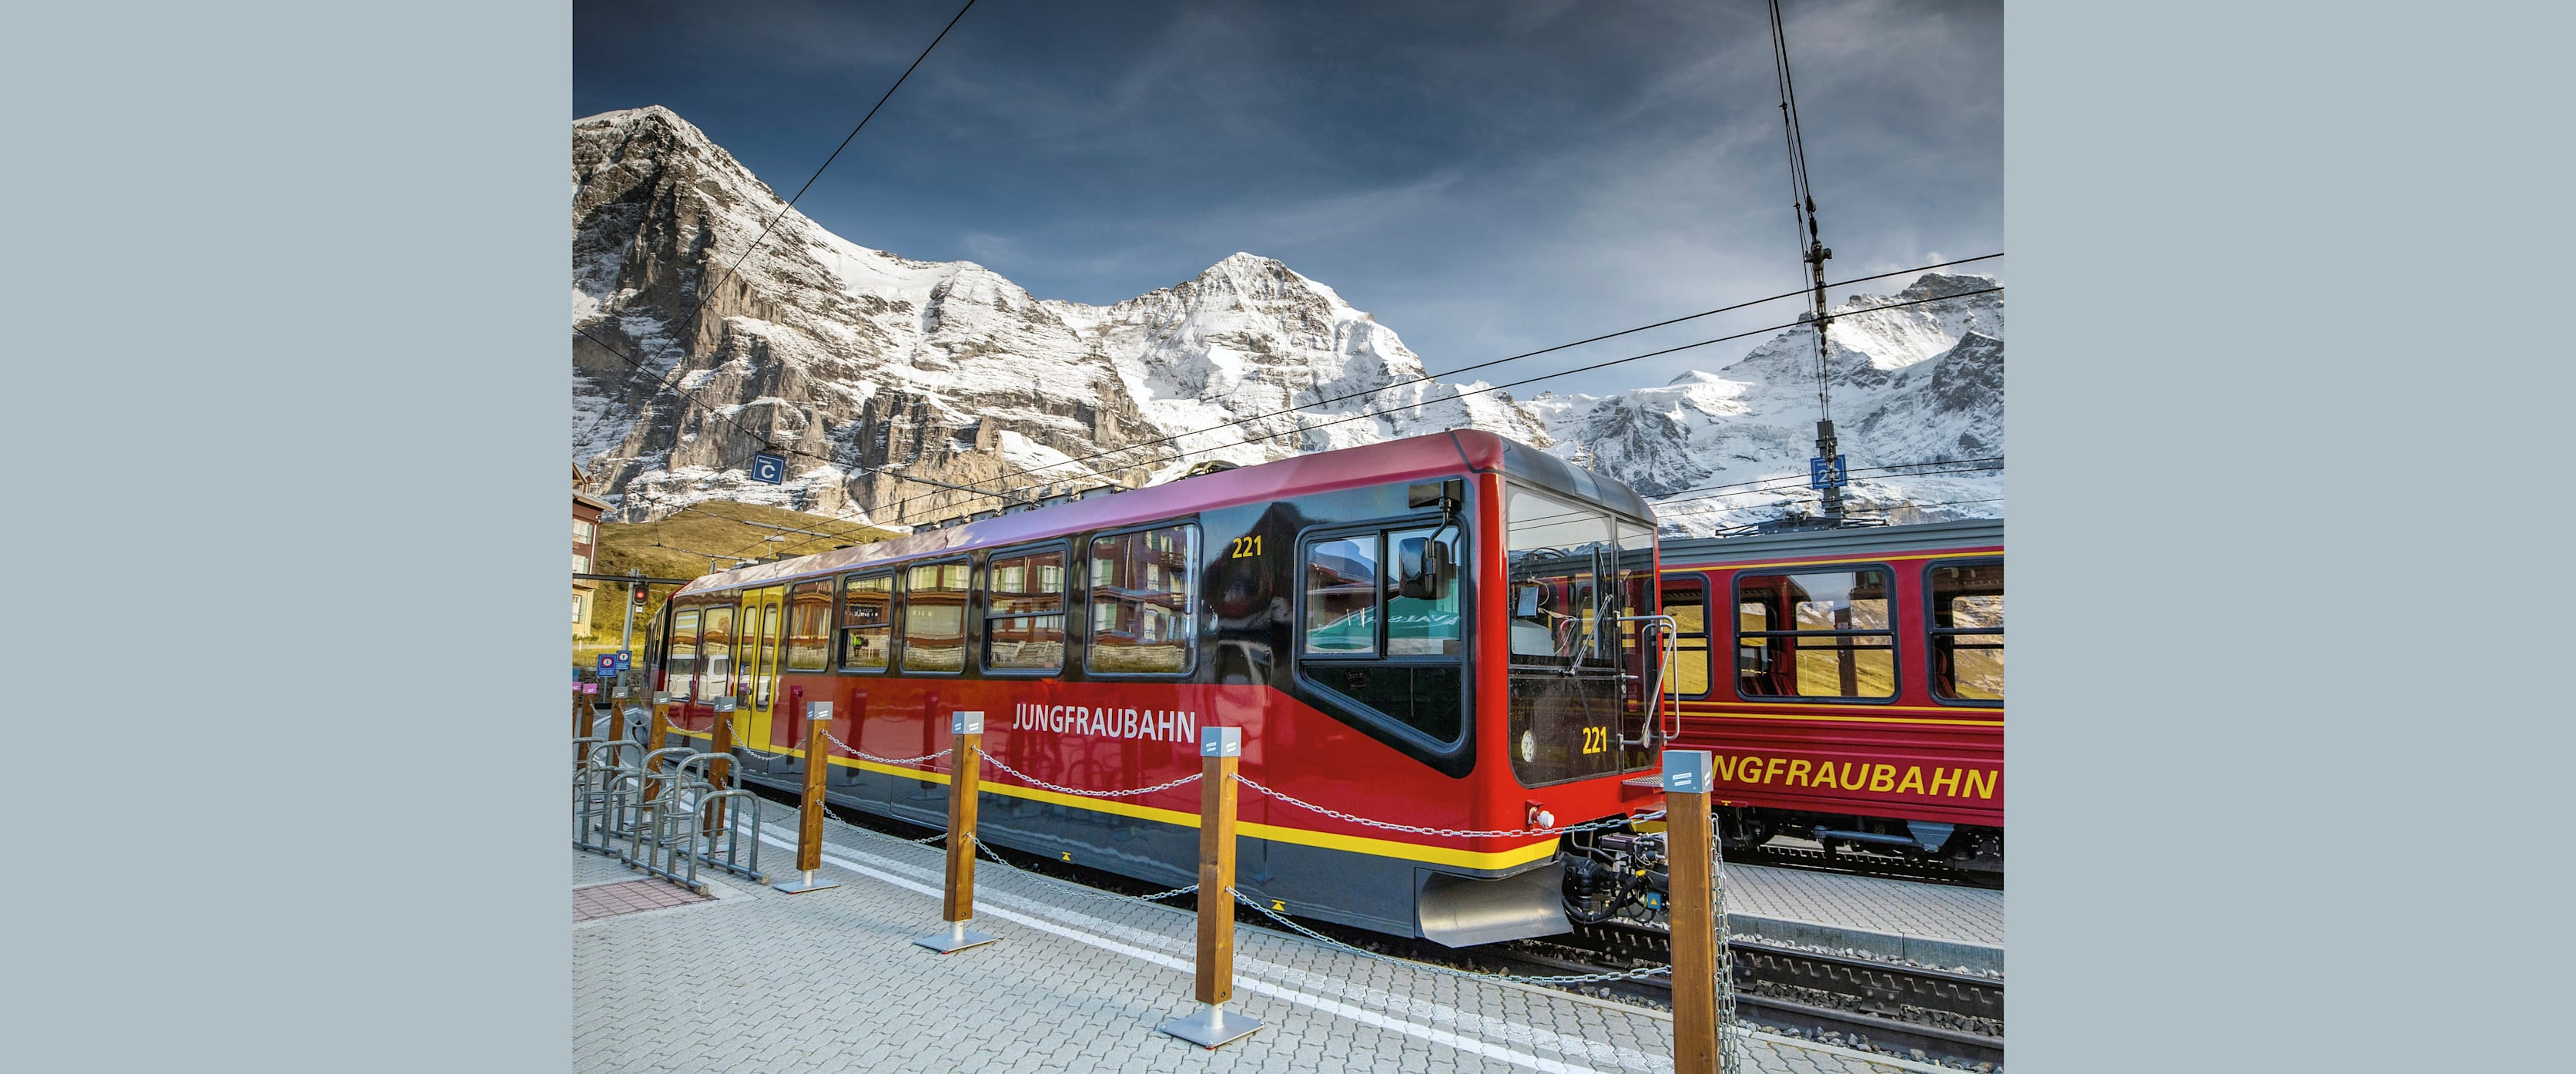 Bilddatenbank, Bilddatenbank-Eiger-Moench-Jungfrau, Bilddatenbank-Jungfraubahn, Bilddatenbank-Kleine-Scheidegg, Bilddatenbank-Sommer, Bilddatenbank-Stichworte, Bilddatenbank-Themen